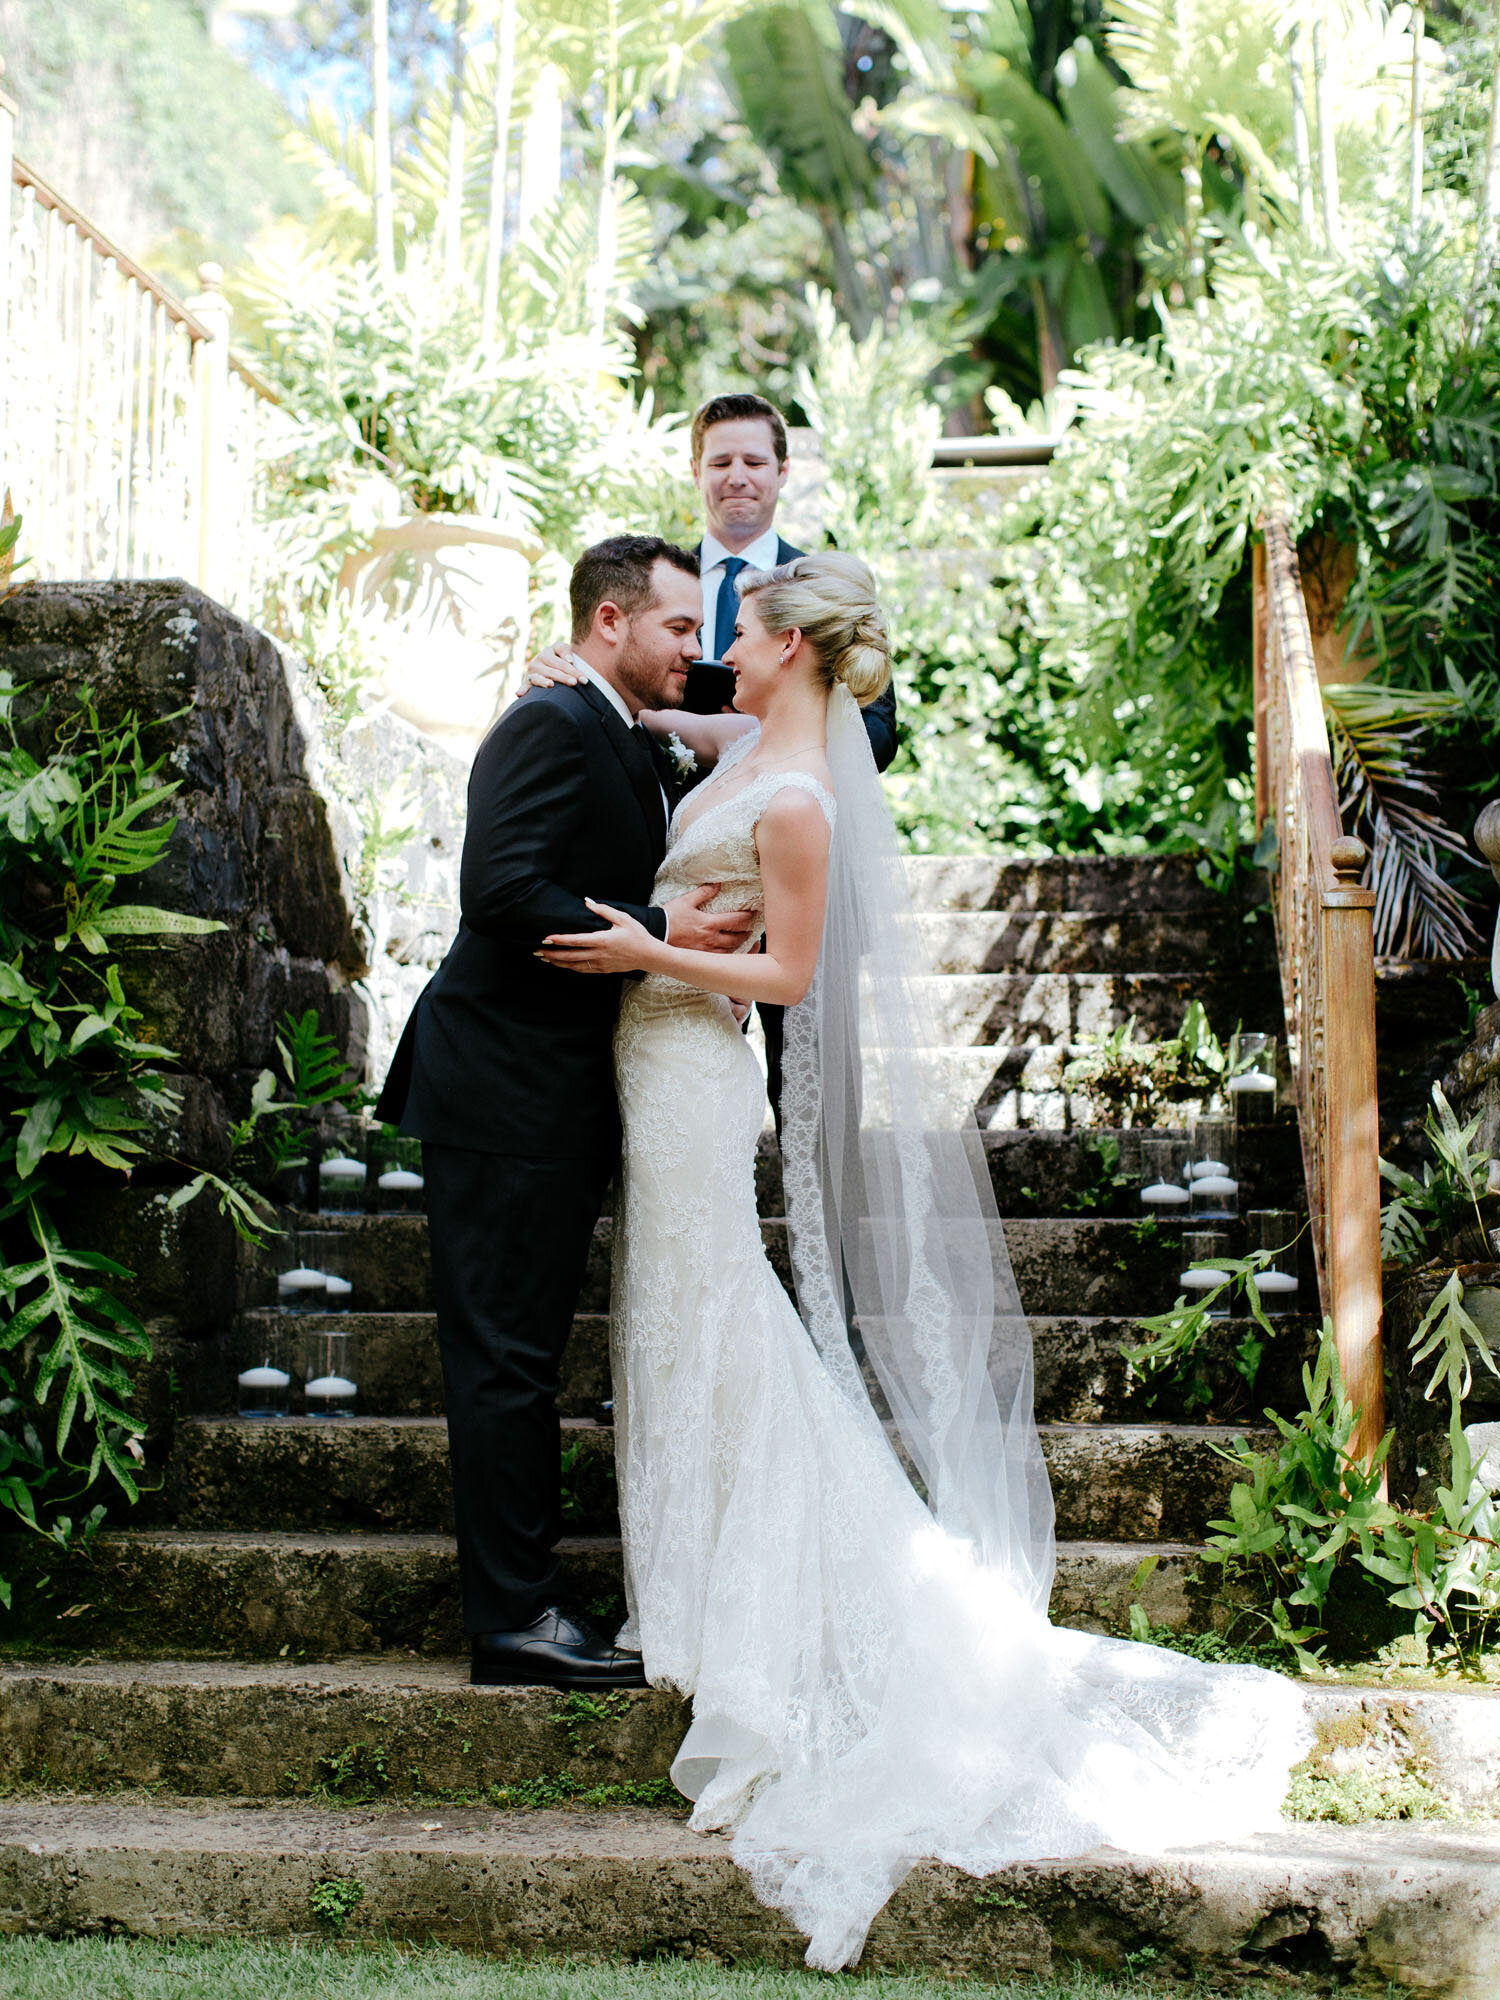 Chris-J-Evans-Maui-Wedding-Kim&Brian2656-Copy1.jpg